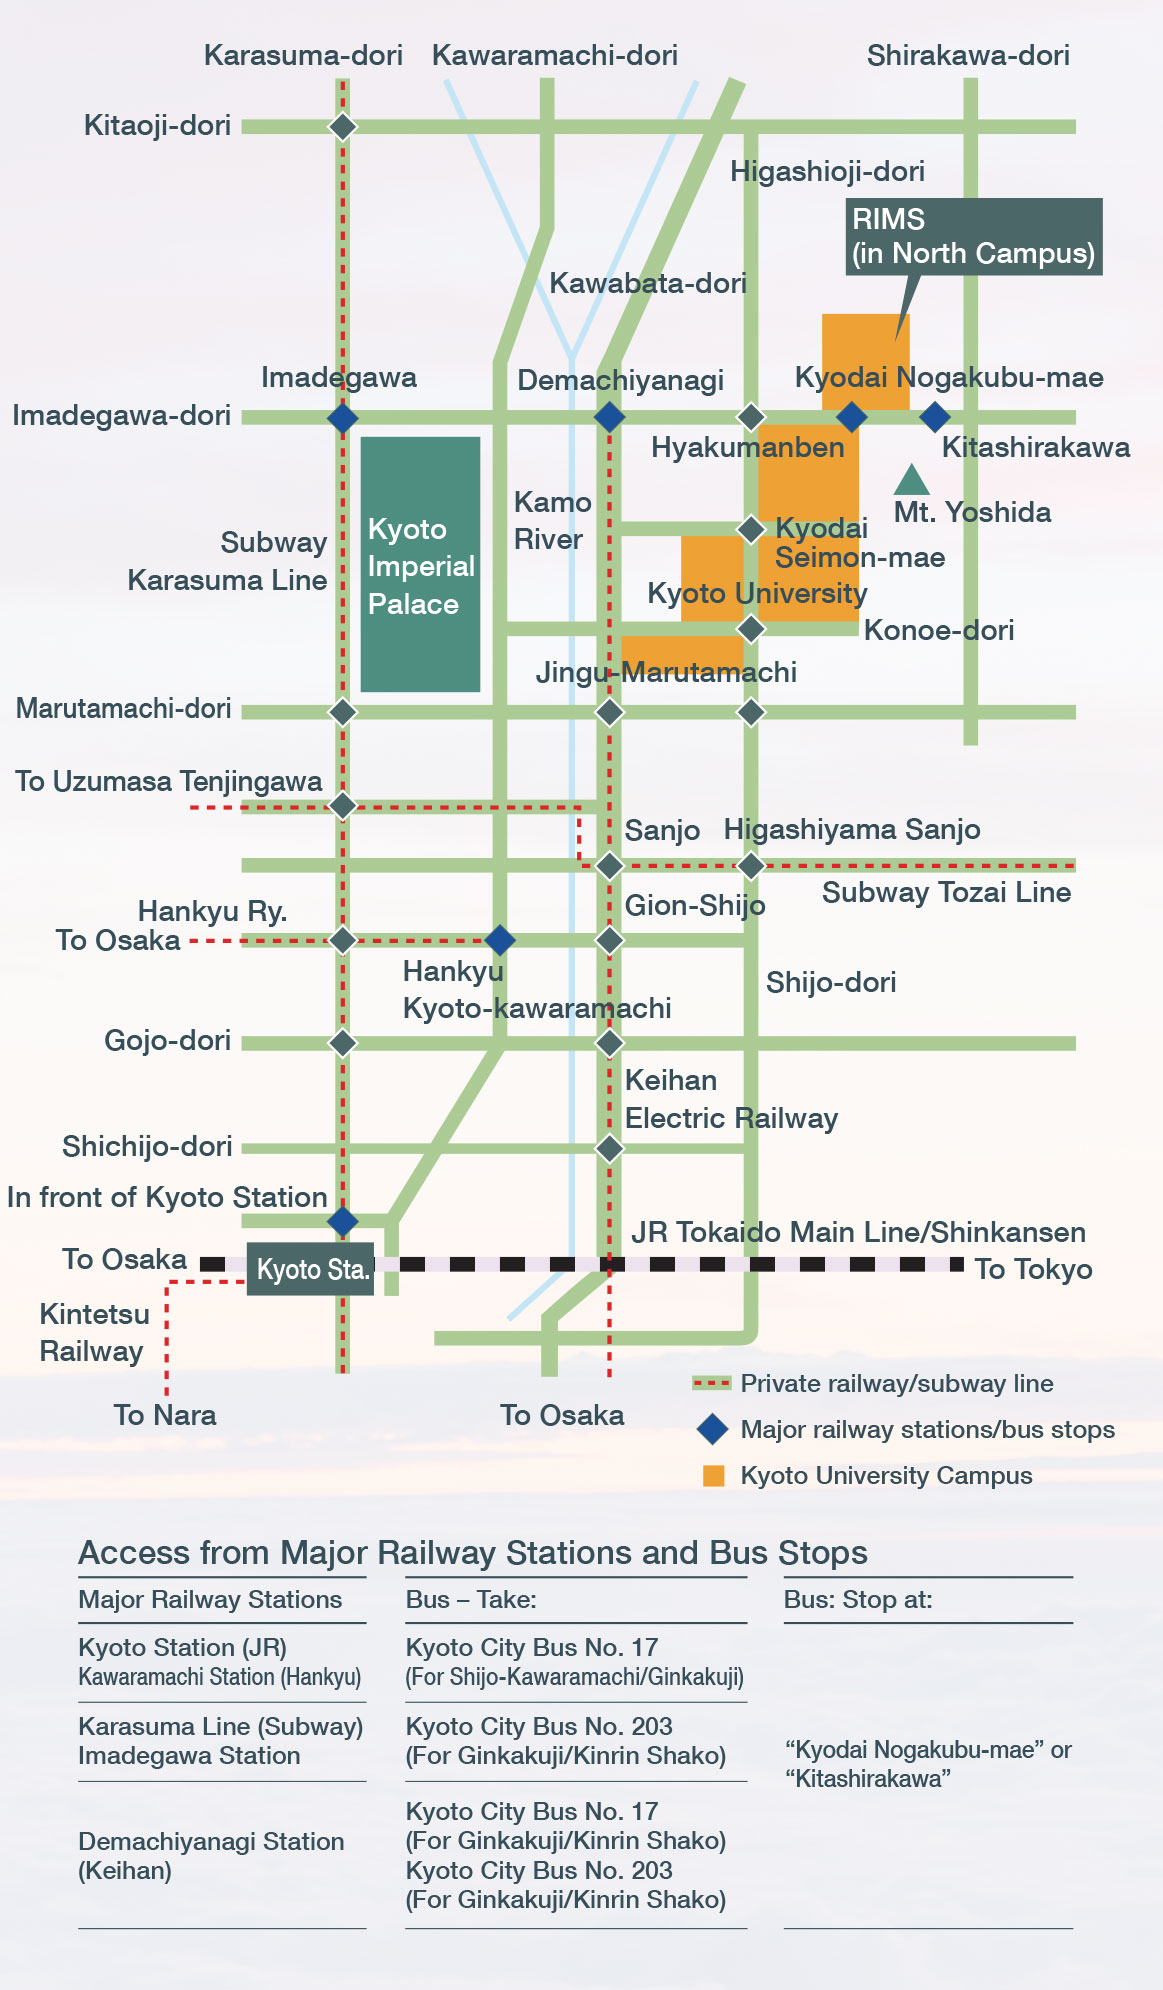 Access RIMS Kyoto Station Map on nagano station map, jiyugaoka station map, shinjuku station map, kamakura station map, tachikawa station map, japan map, kanazawa station map, uji station map, matsumoto station map, niigata station map, takasaki station map, fujisawa station map, kawaguchiko station map, shizuoka station map, city bus line map, kobe map, tofukuji station map, amagasaki station map, hakodate station map,